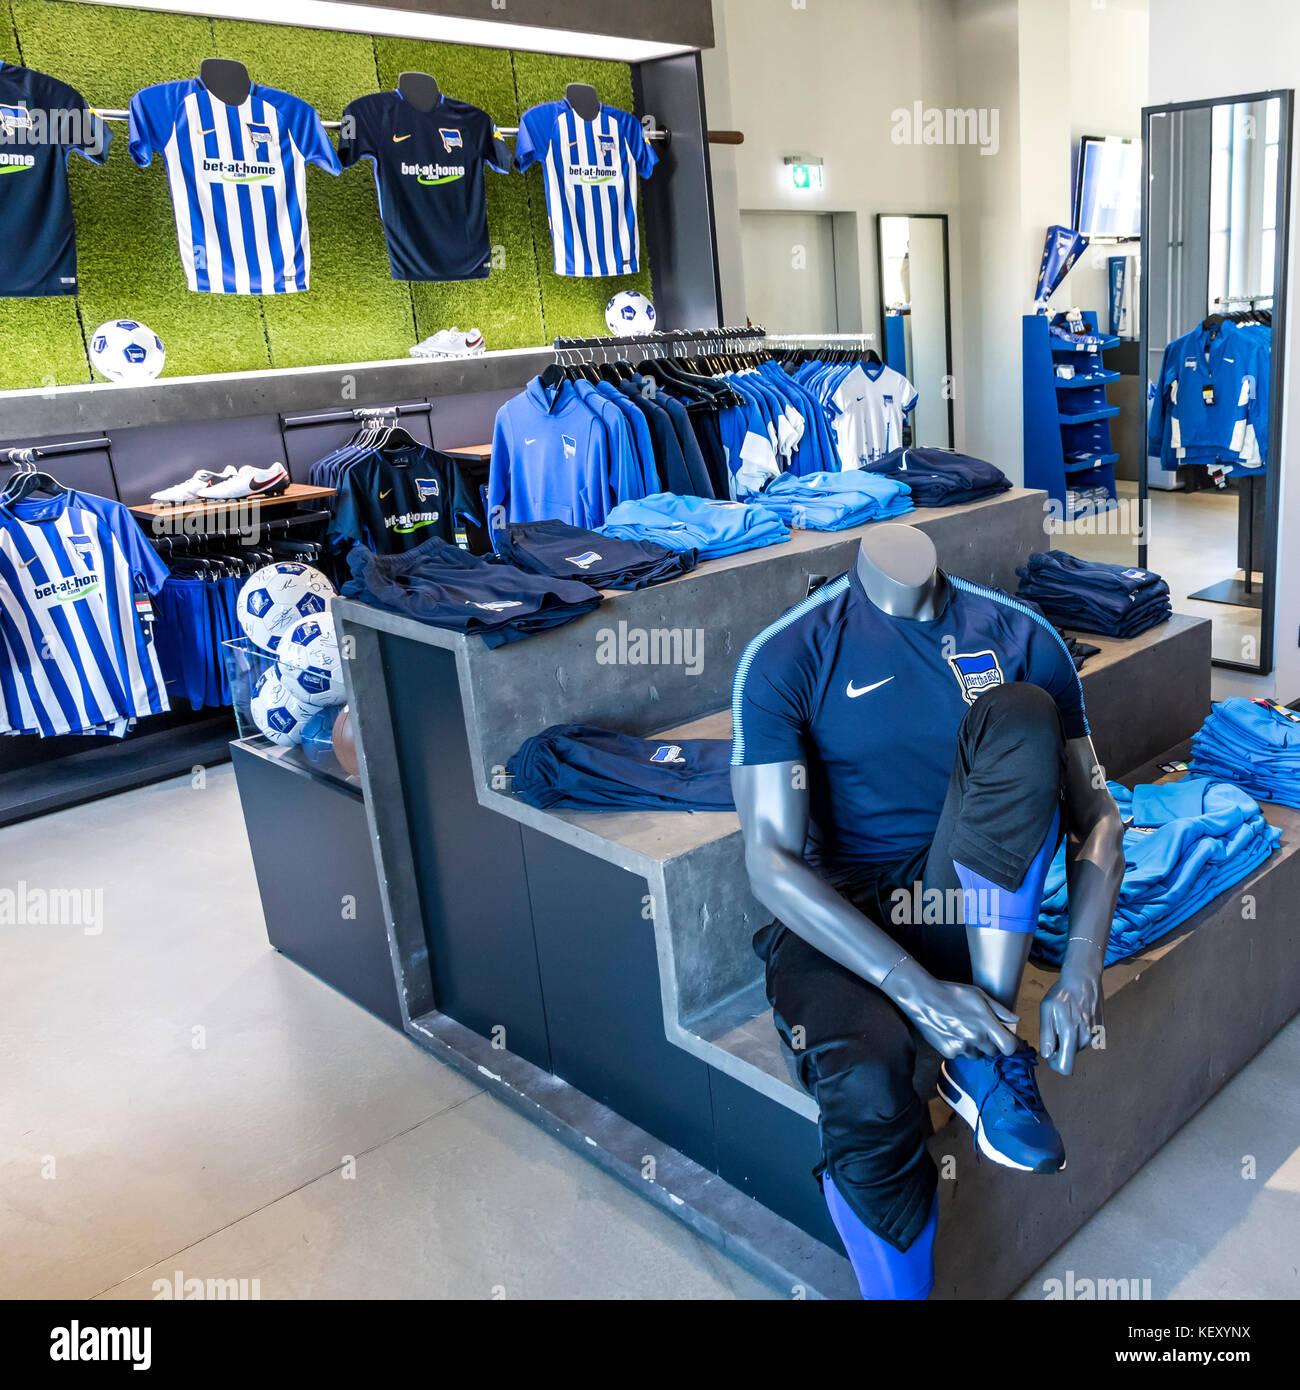 bundesliga football club stock photos bundesliga football club stock images alamy. Black Bedroom Furniture Sets. Home Design Ideas